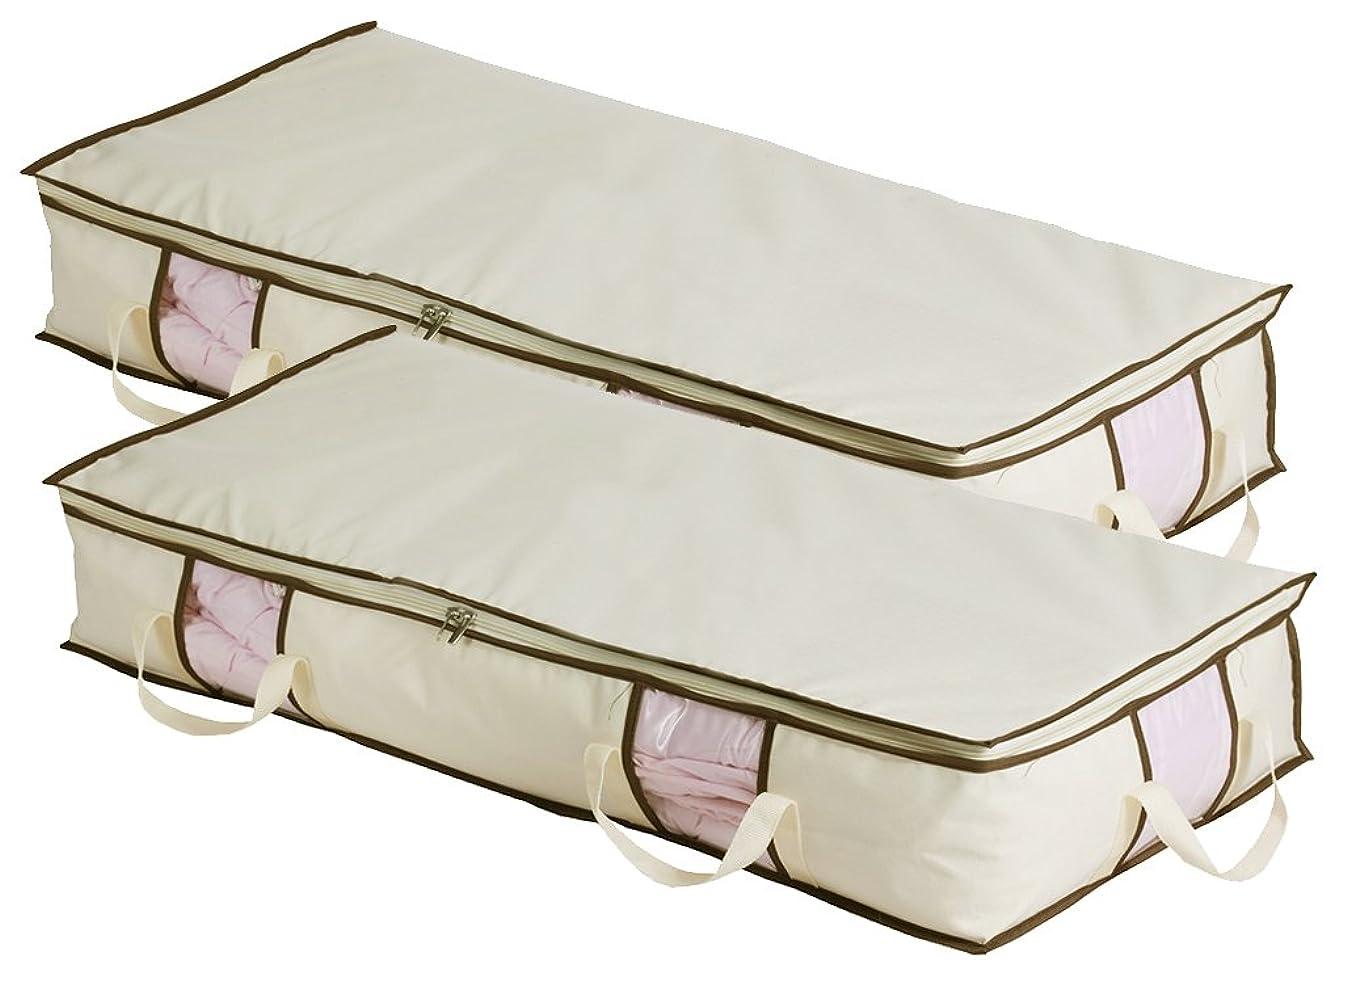 MISSLO Jumbo Under The Bed Organizer for Comforters, Blanket Storage, Set of 2